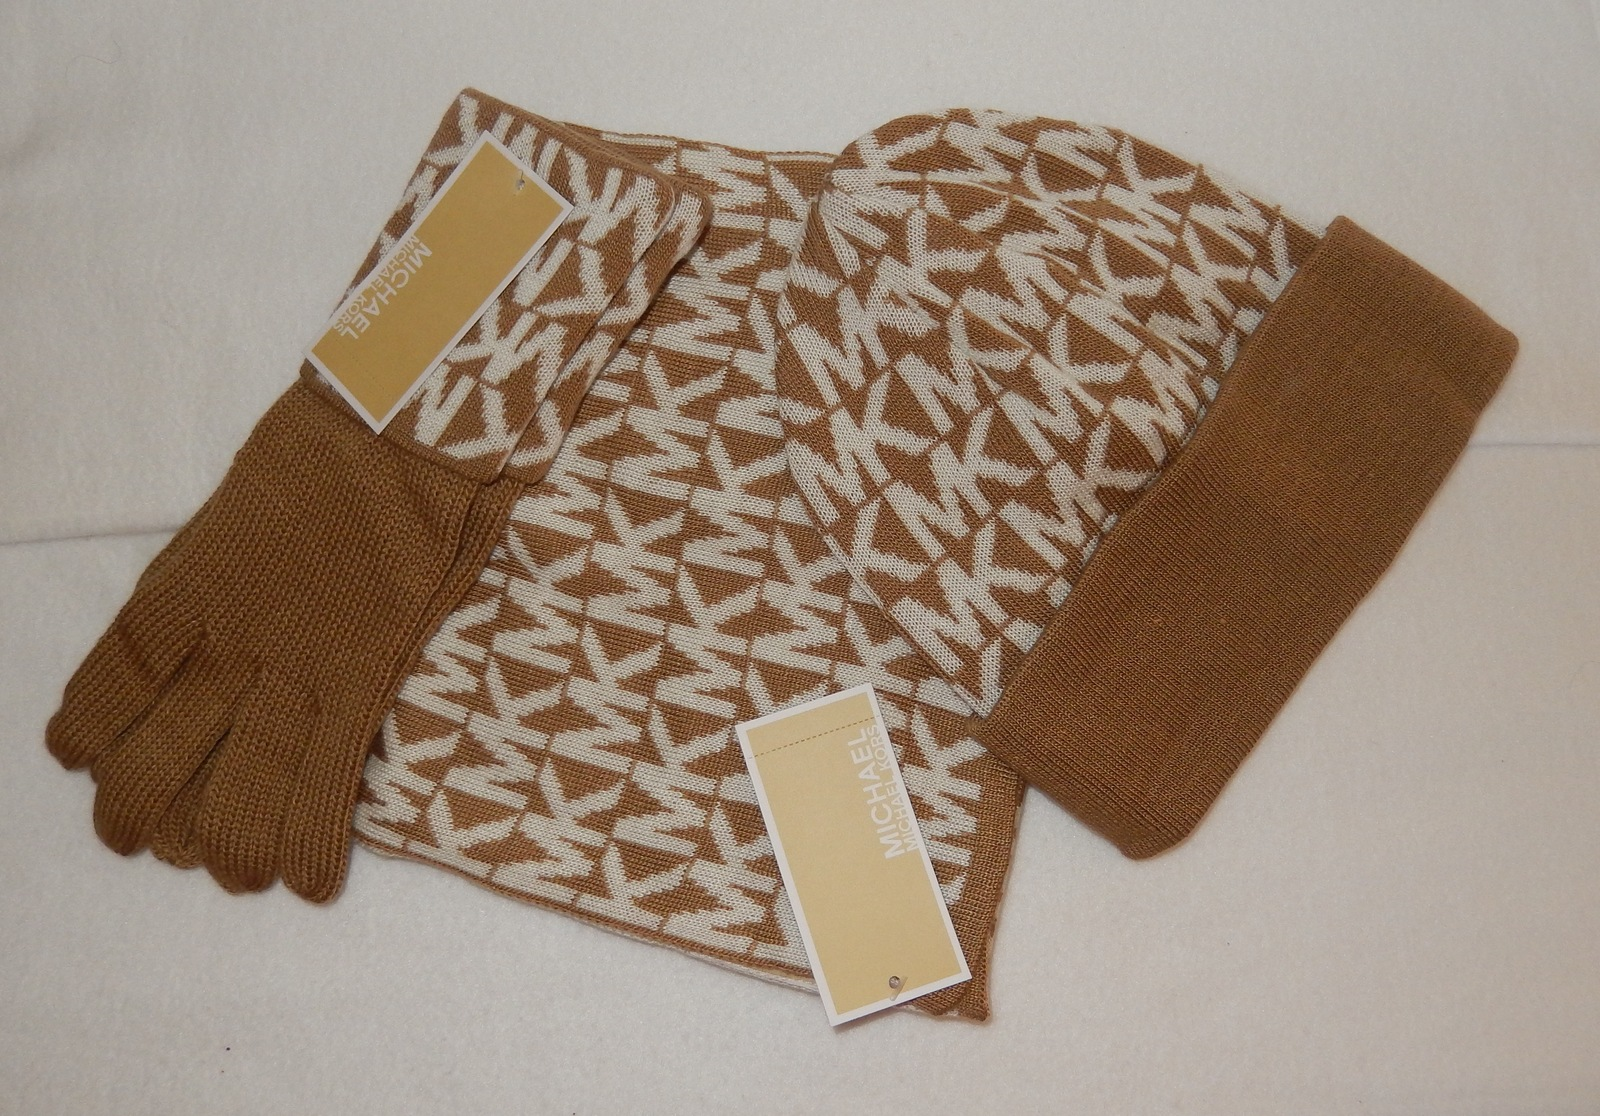 michael kors scarf hat gloves set beige white mk logo